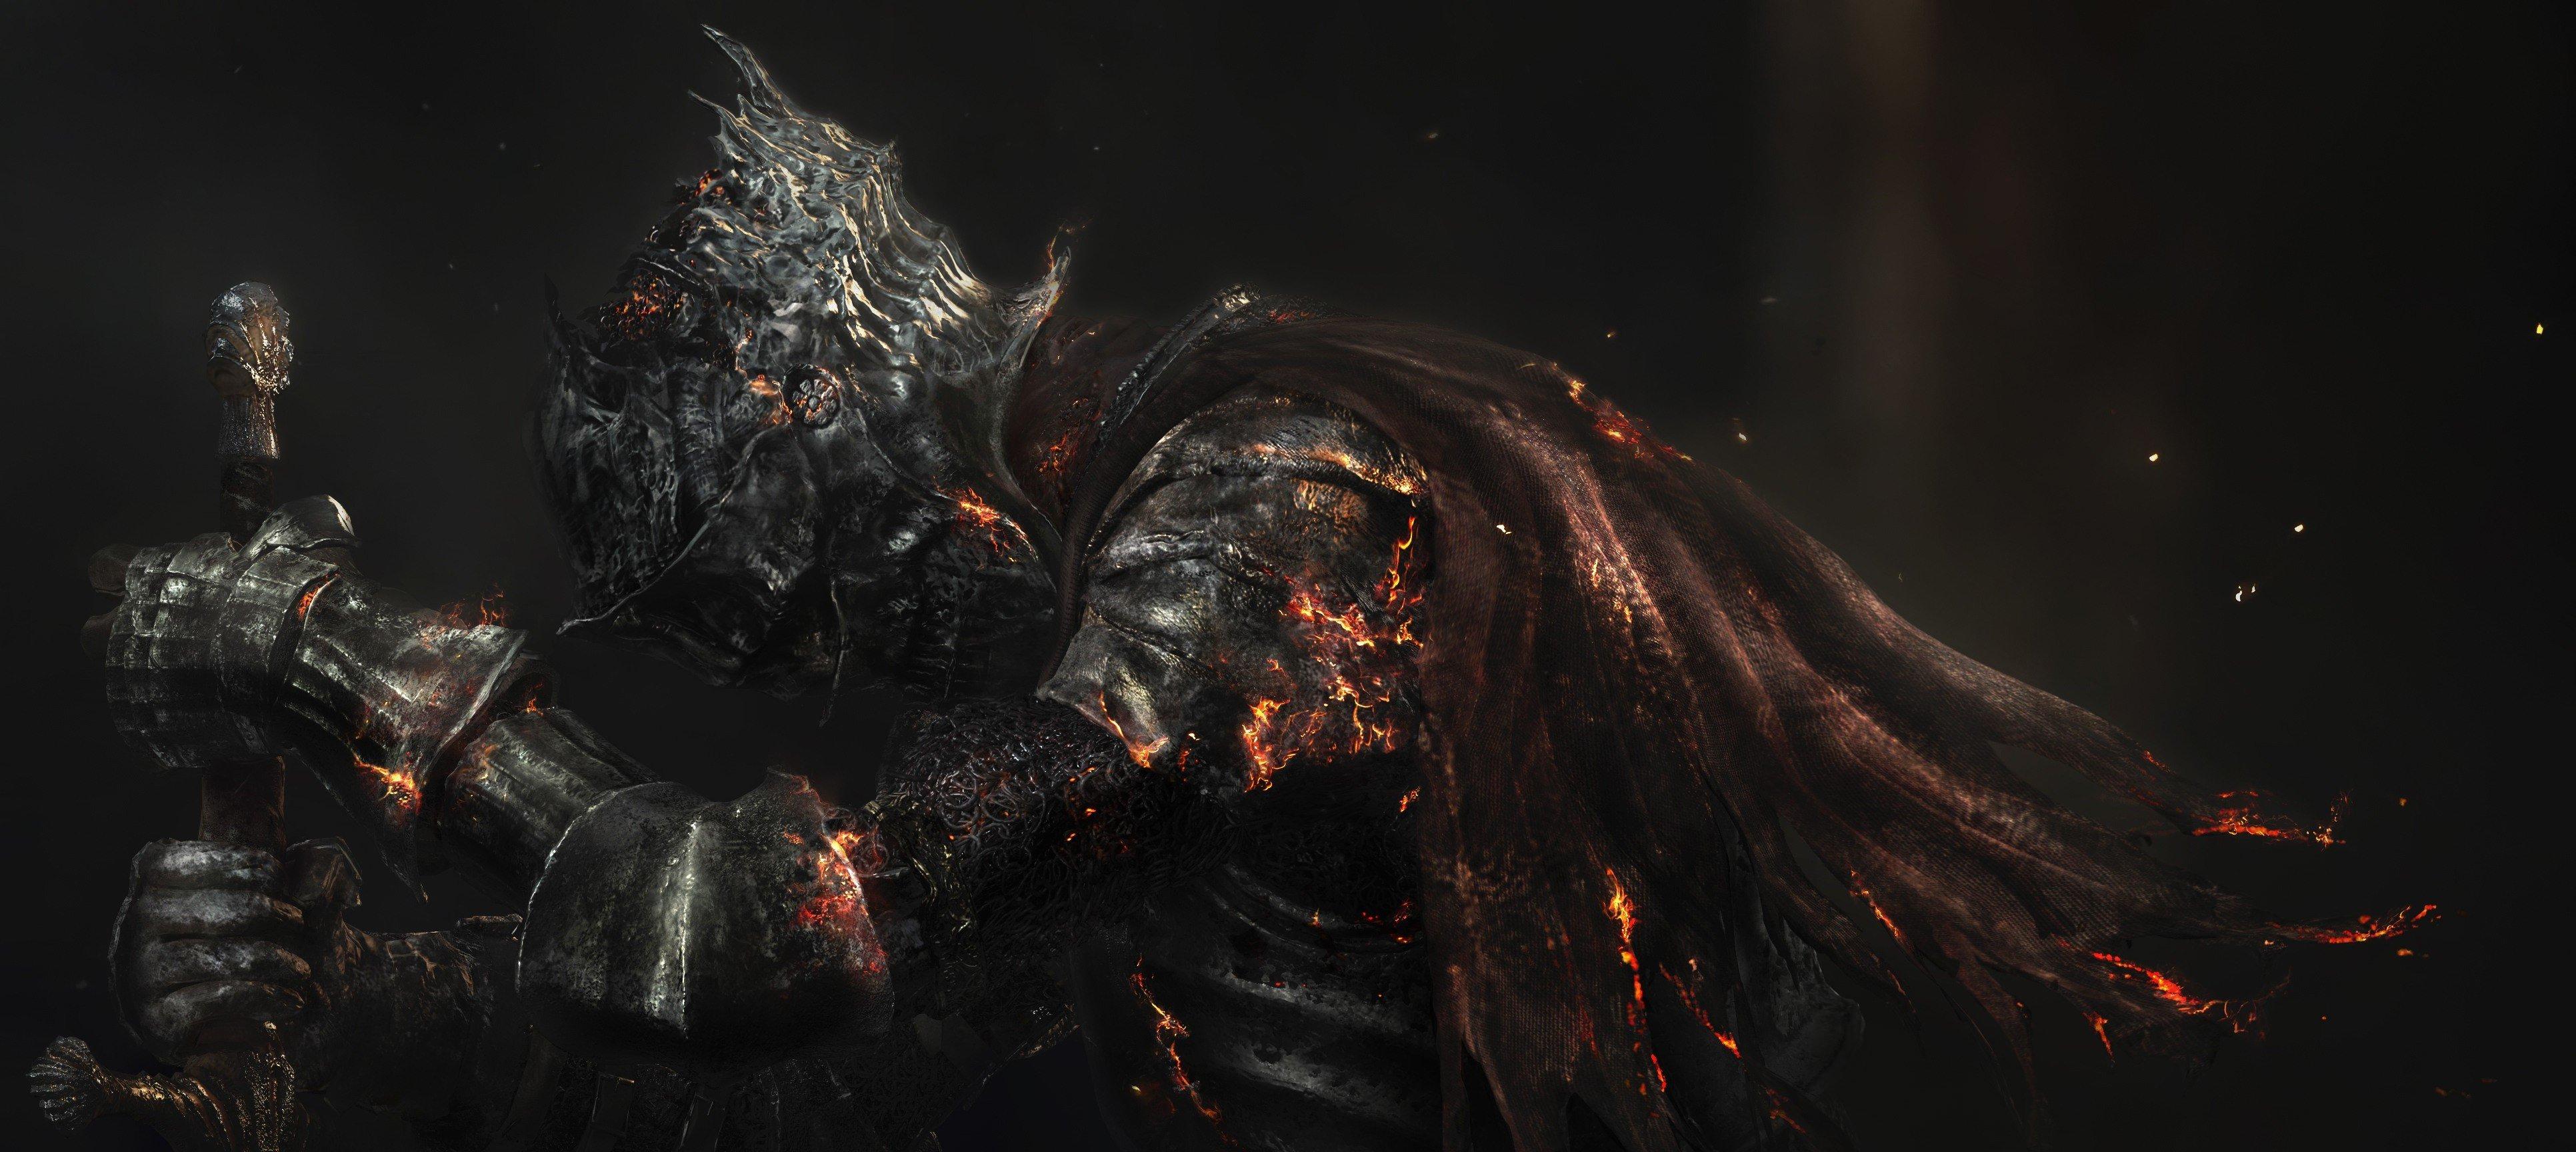 Dark Souls 3 Trialer, HD Games, 4k Wallpapers, Images